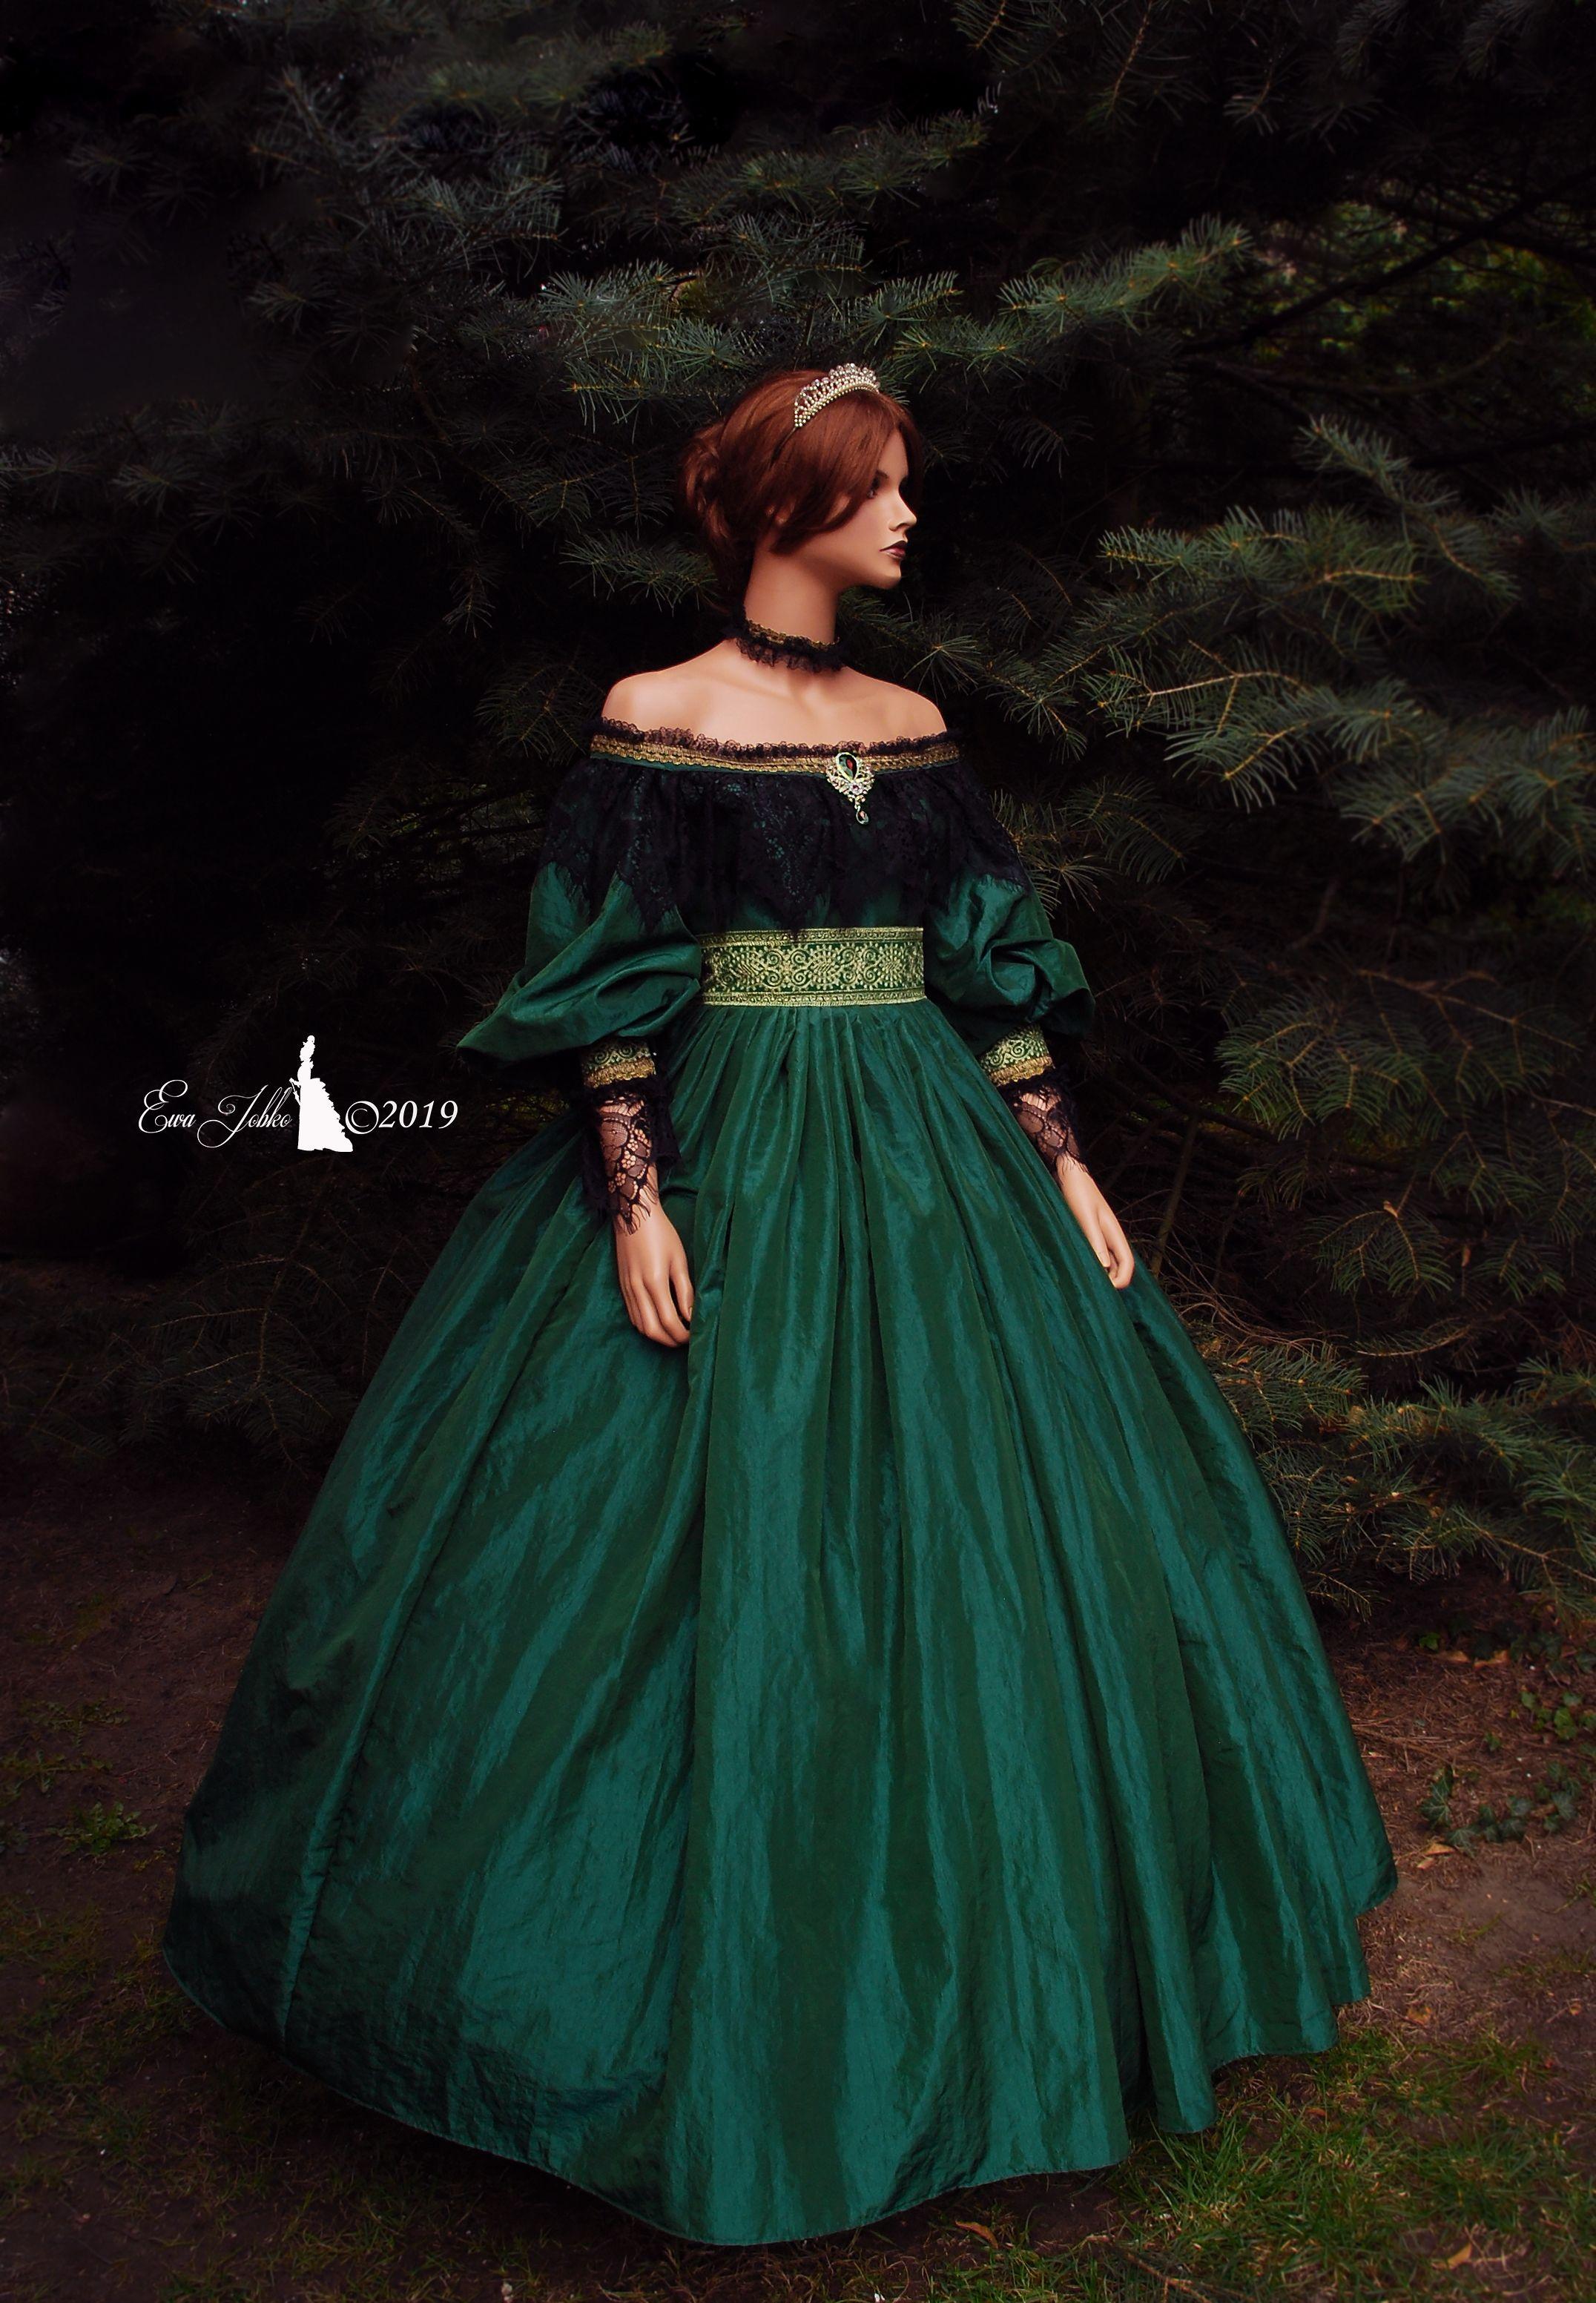 Pin By Settampola On My Work Queen Dress Fairytale Dress Victorian Dress [ 3105 x 2152 Pixel ]